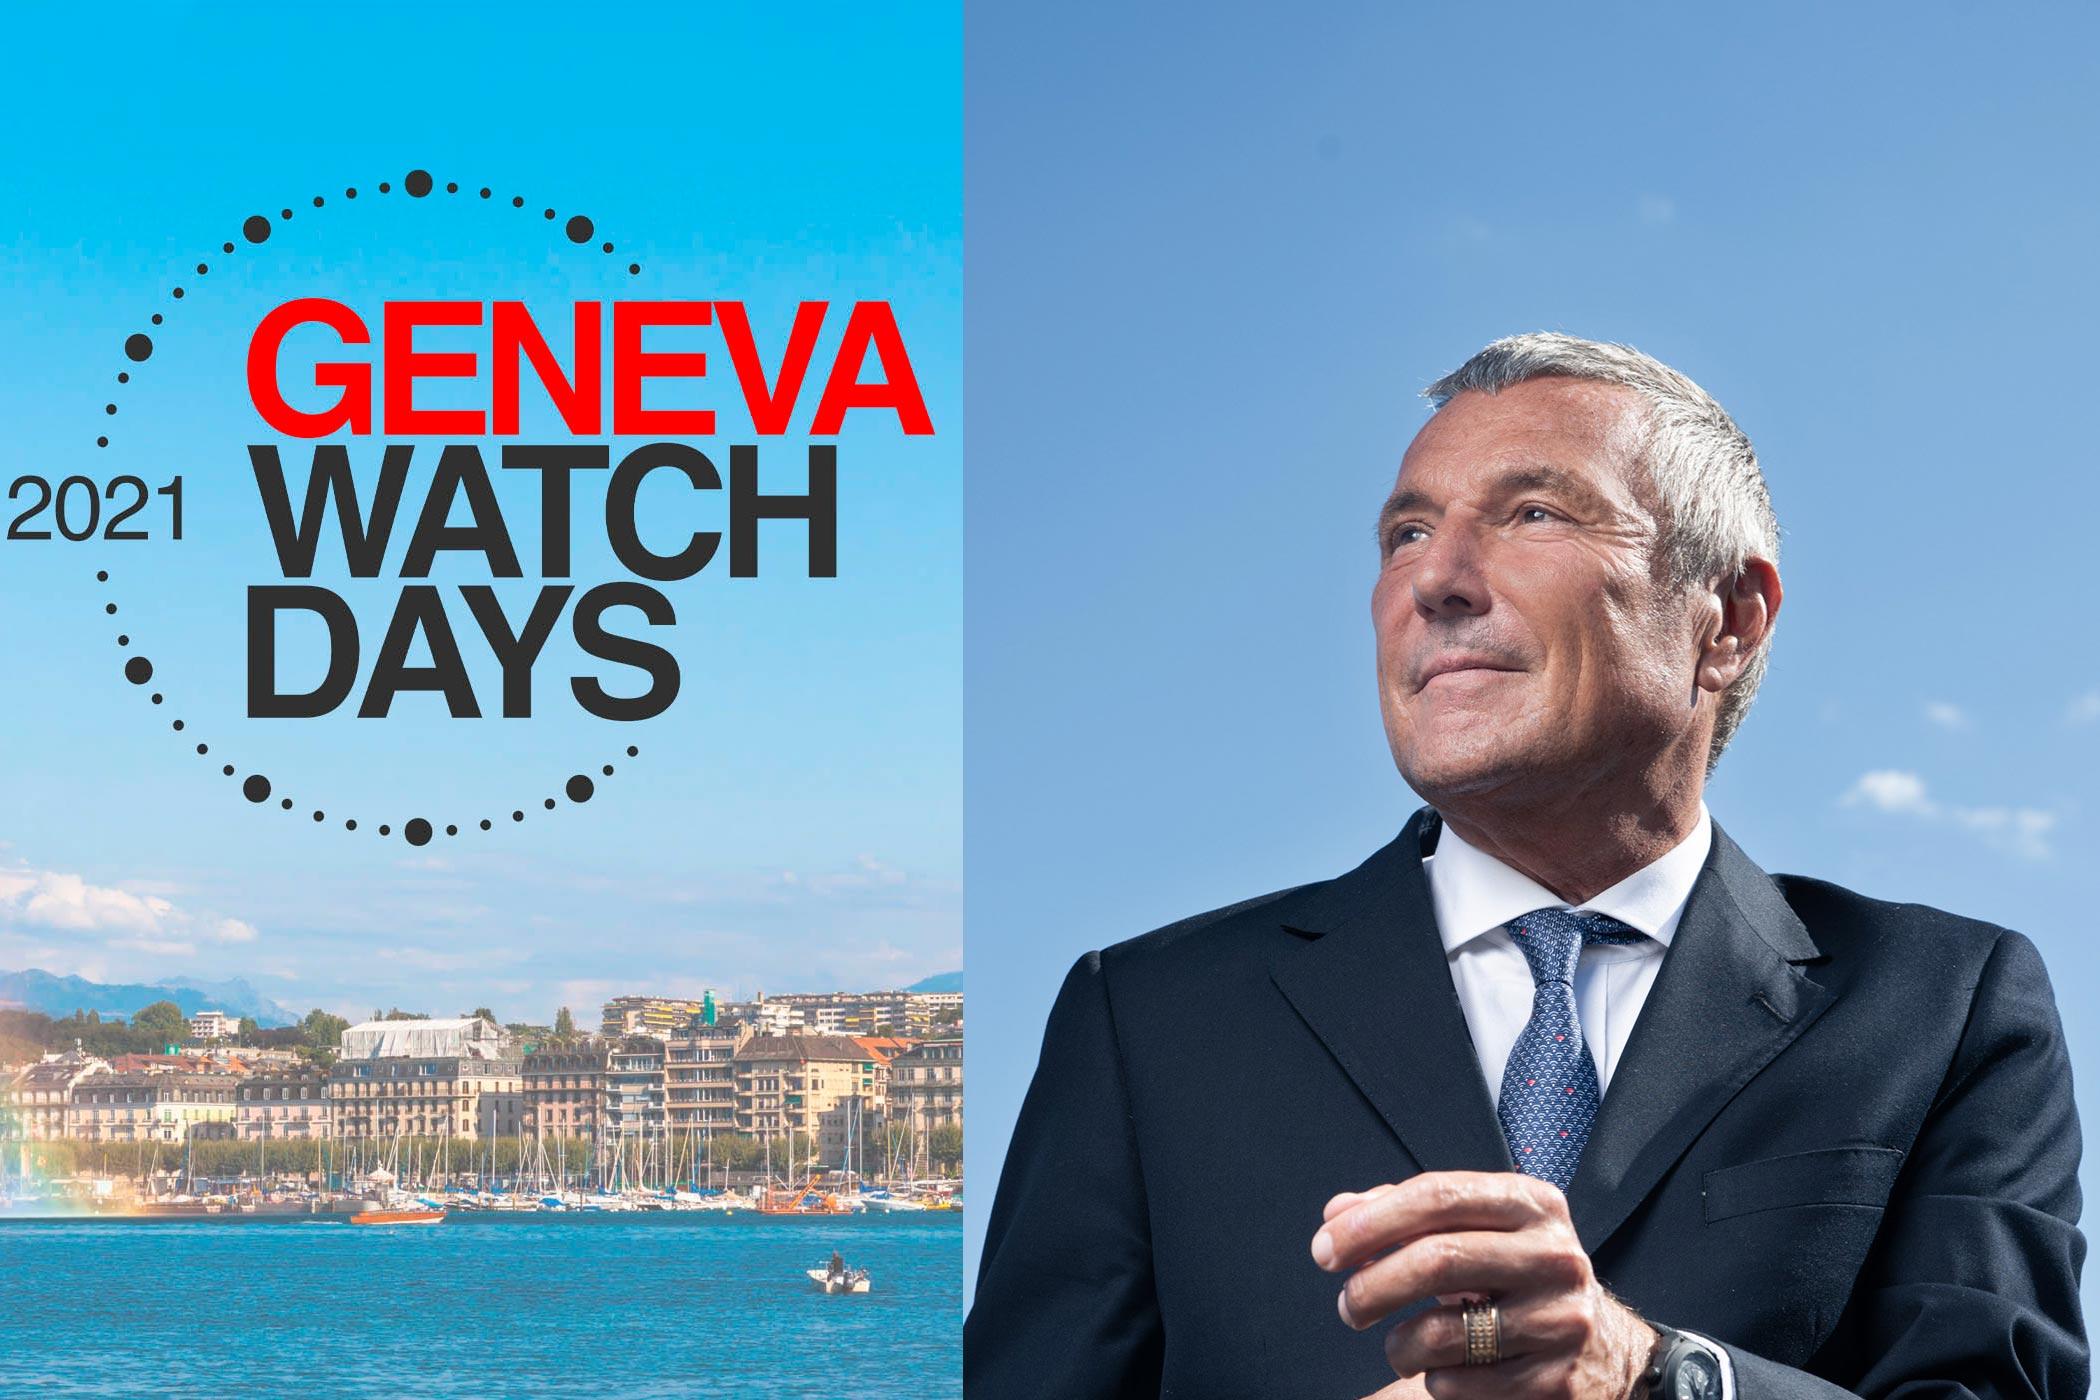 Geneva Watch Day 2021